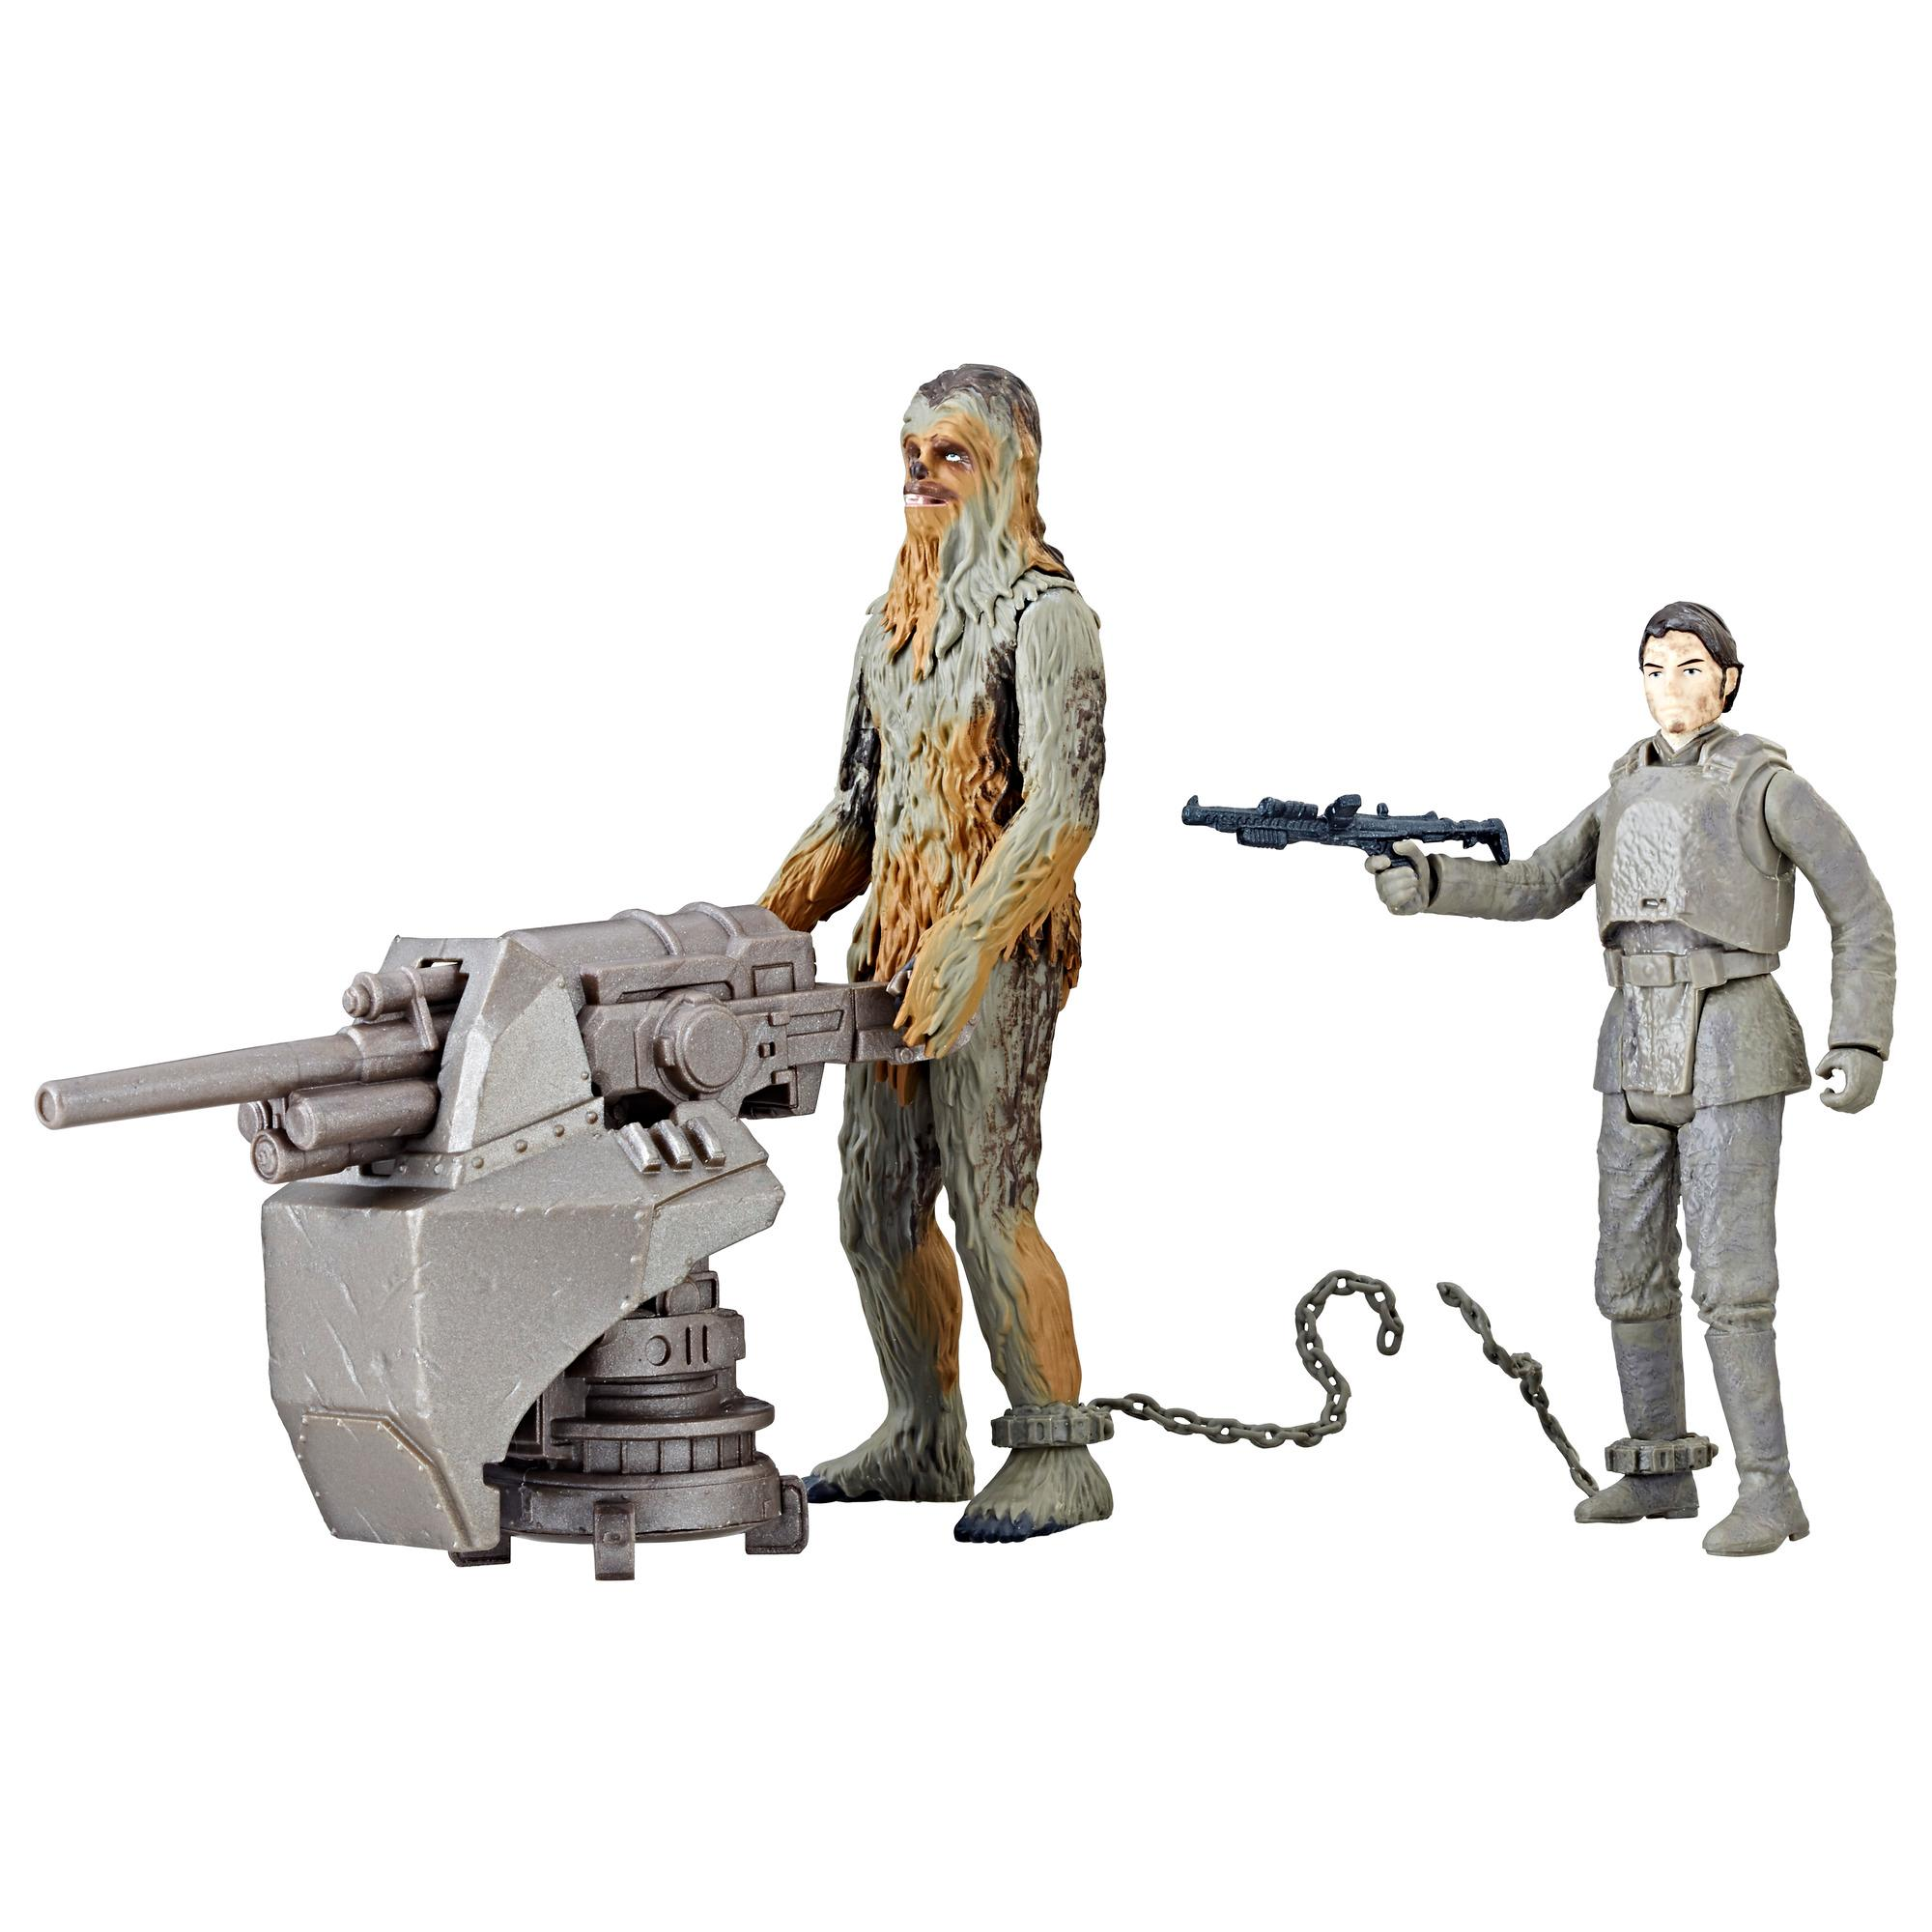 Star Wars Force Link 2.0 Han Solo (Mimban) & Chewbacca (Mimban) 2-Pack